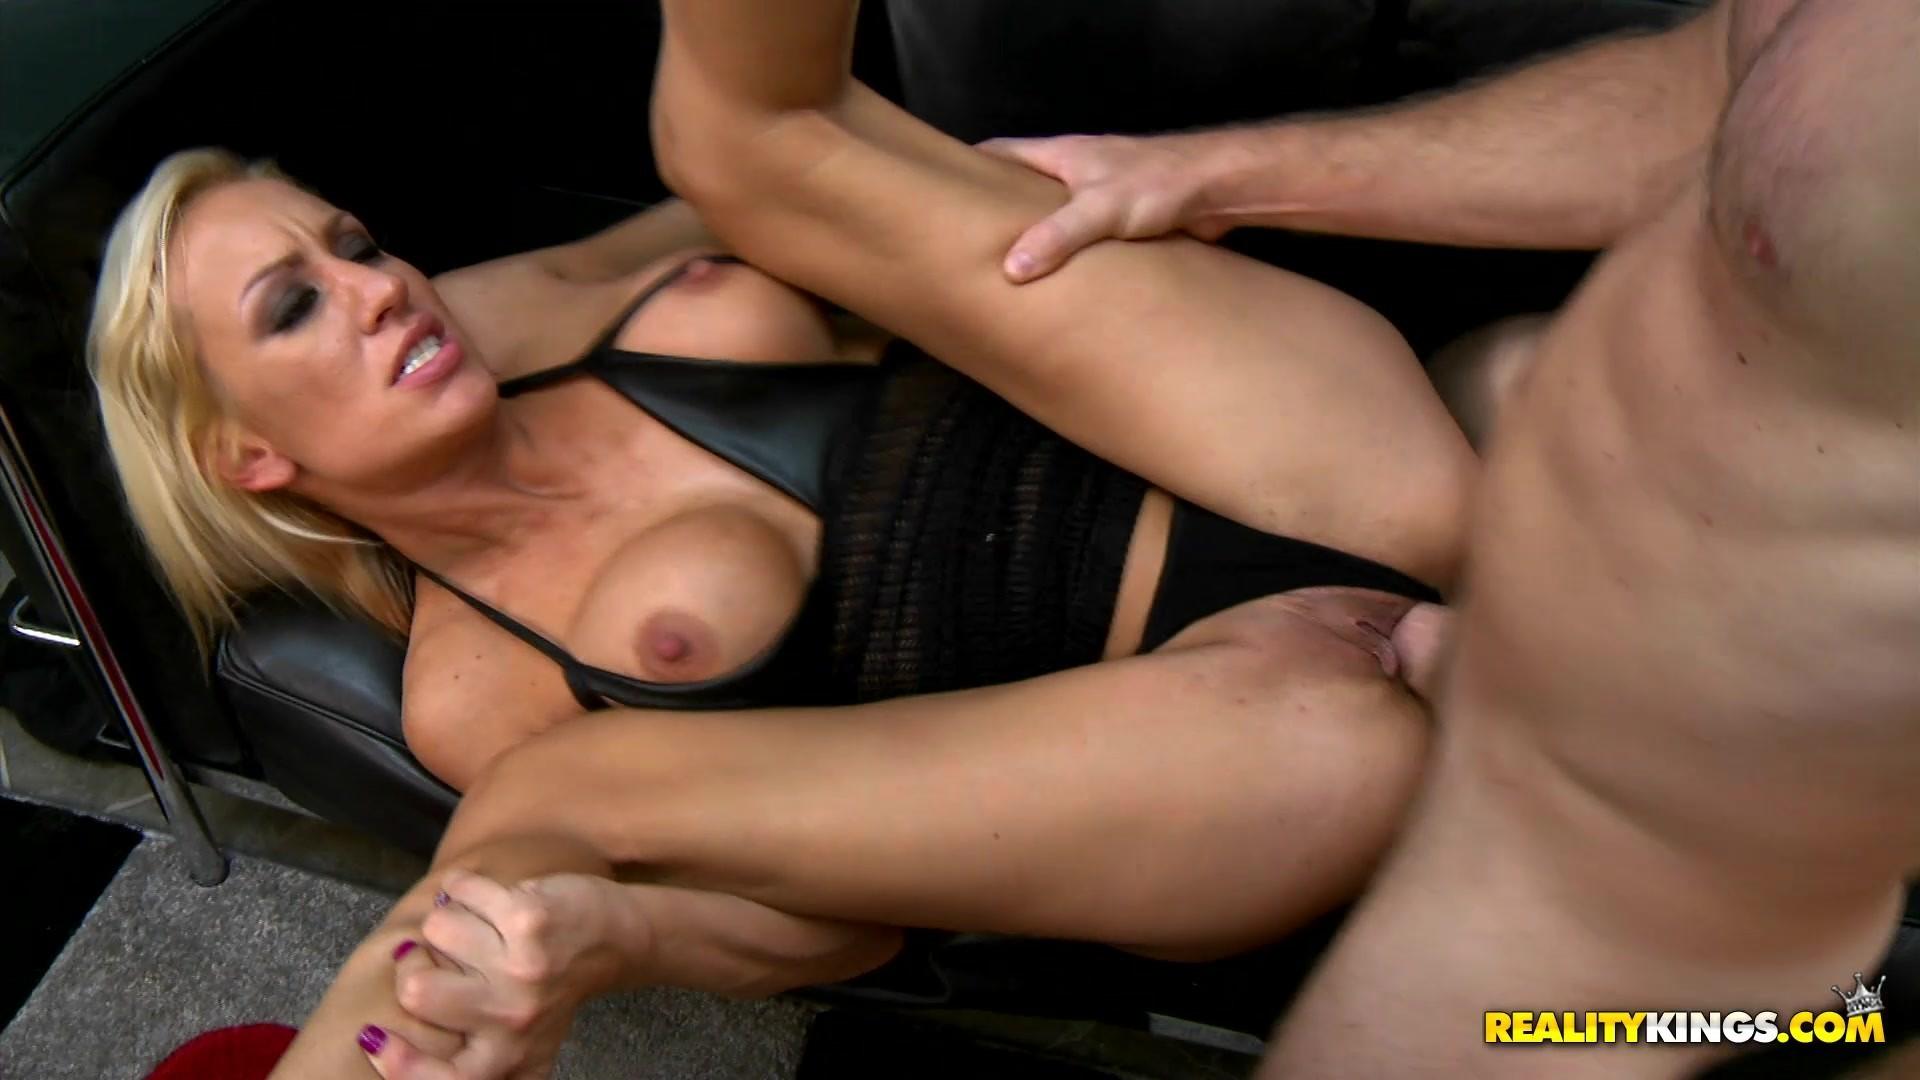 Pornstar jamie lynns lucious thighs